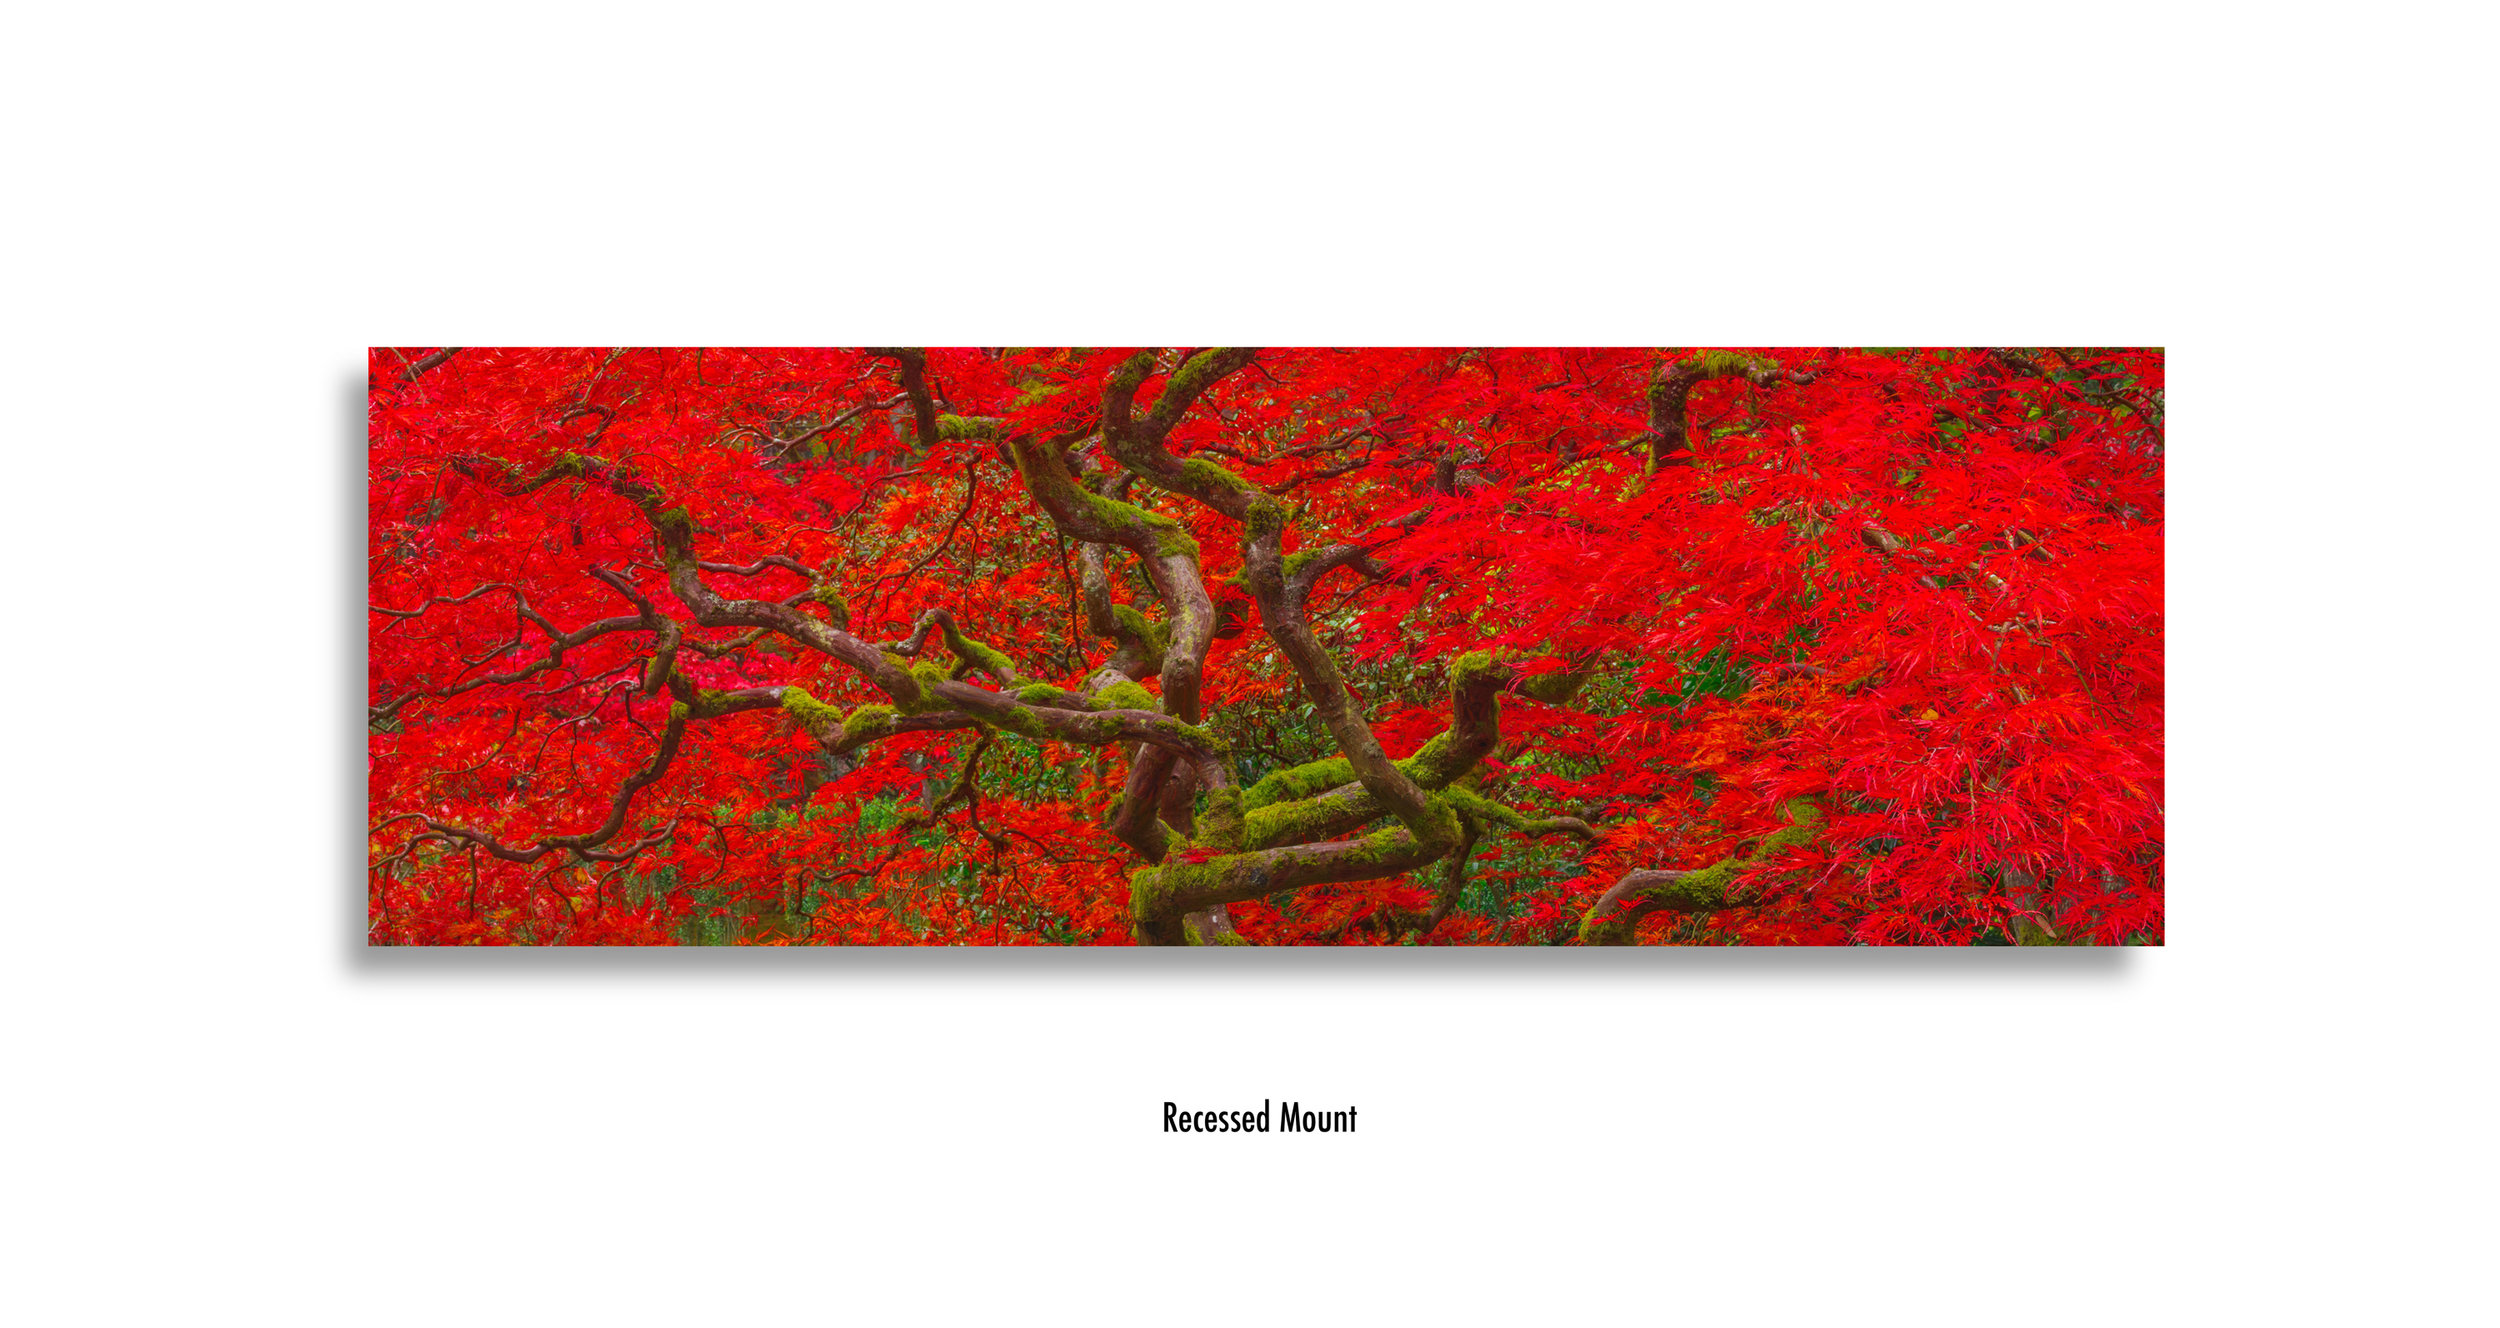 Avendasora-Leaf-recessed-mount.jpg